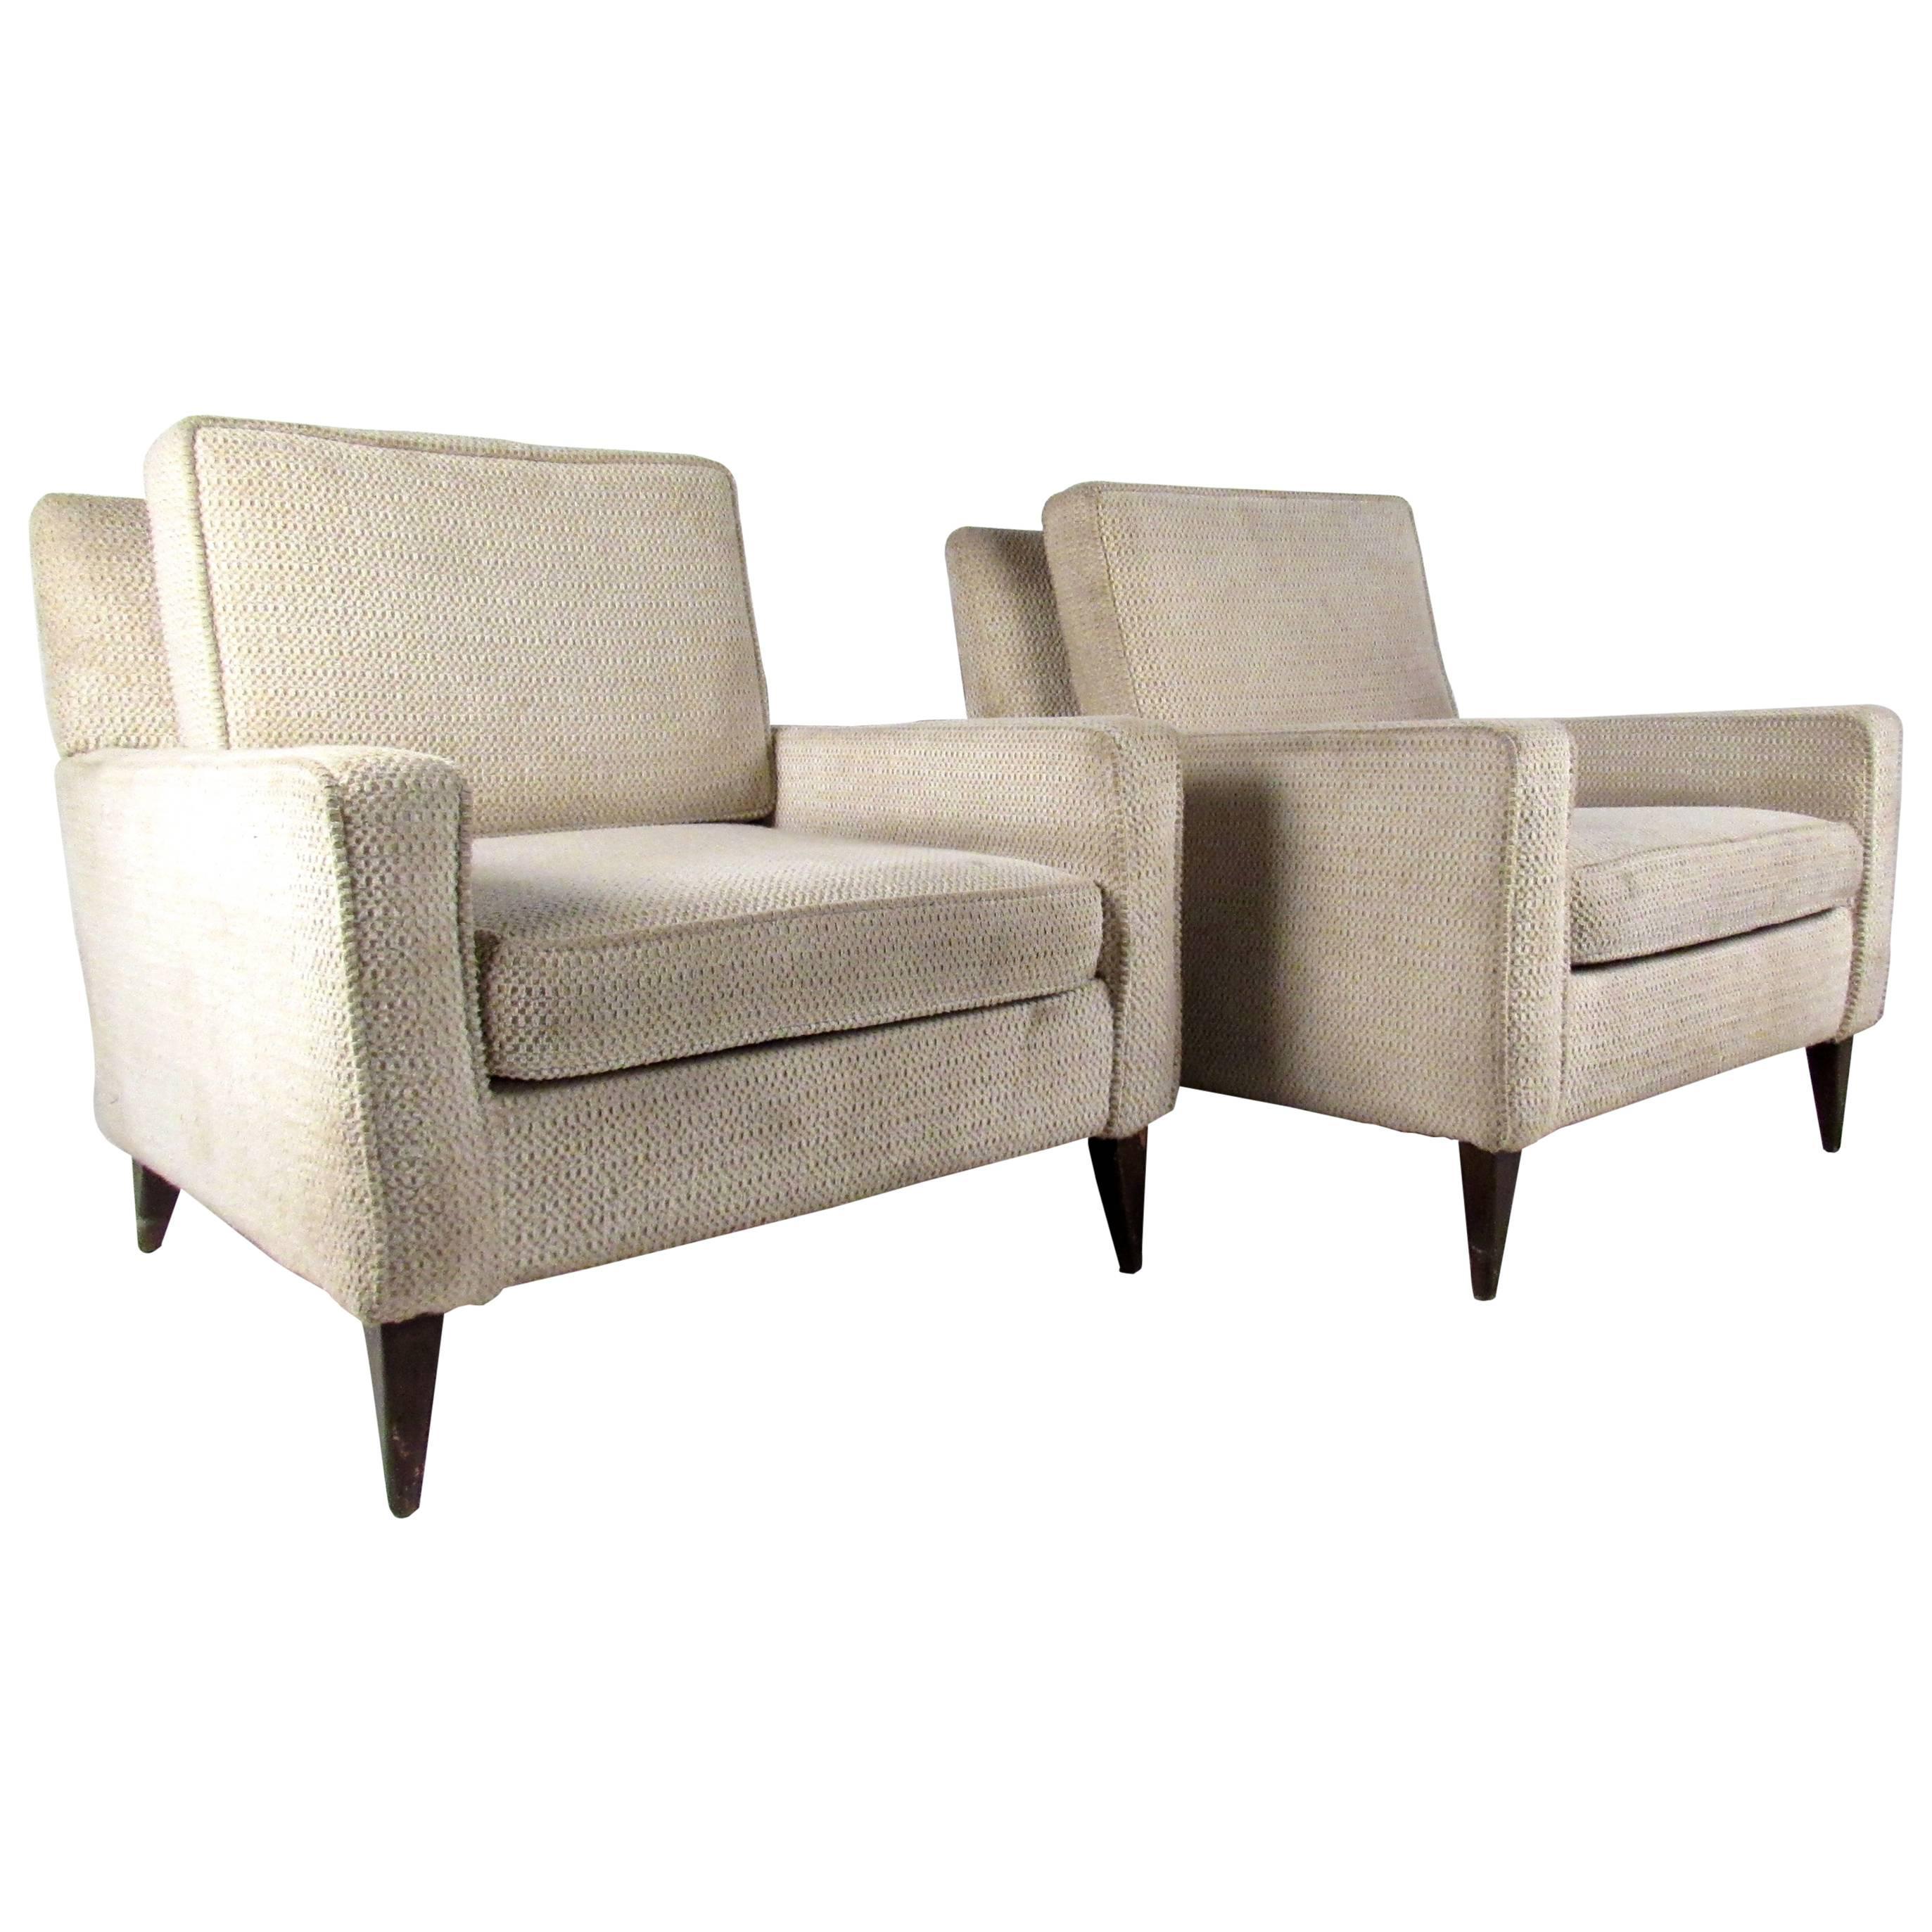 Pair Midcentury Paul McCobb Style Lounge Chairs